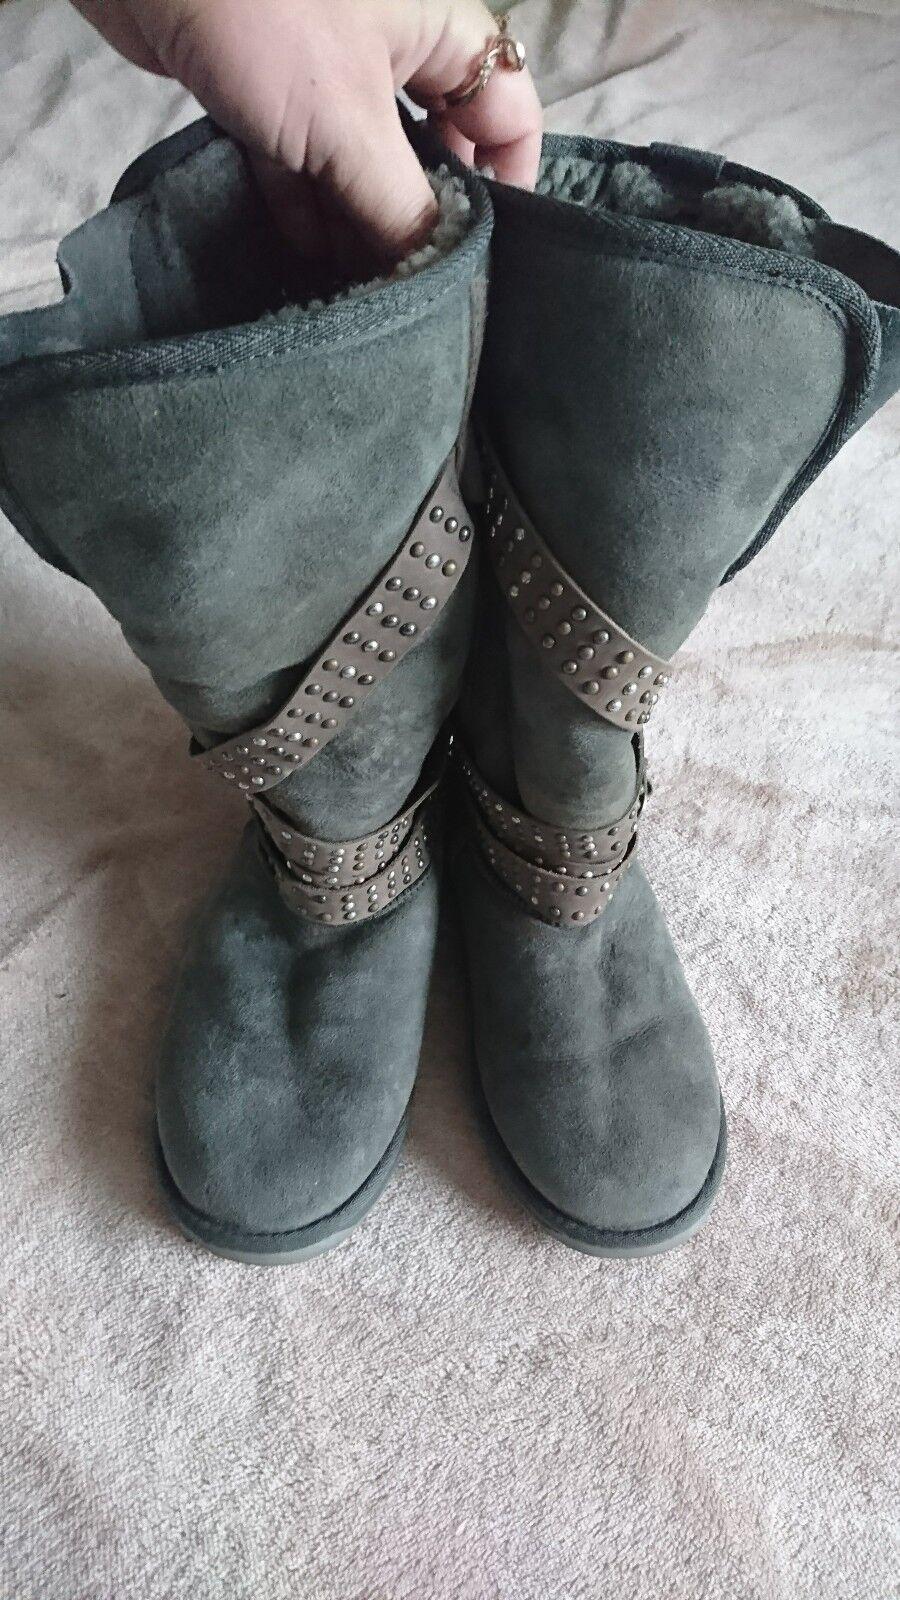 botas de piel de oveja la UEM